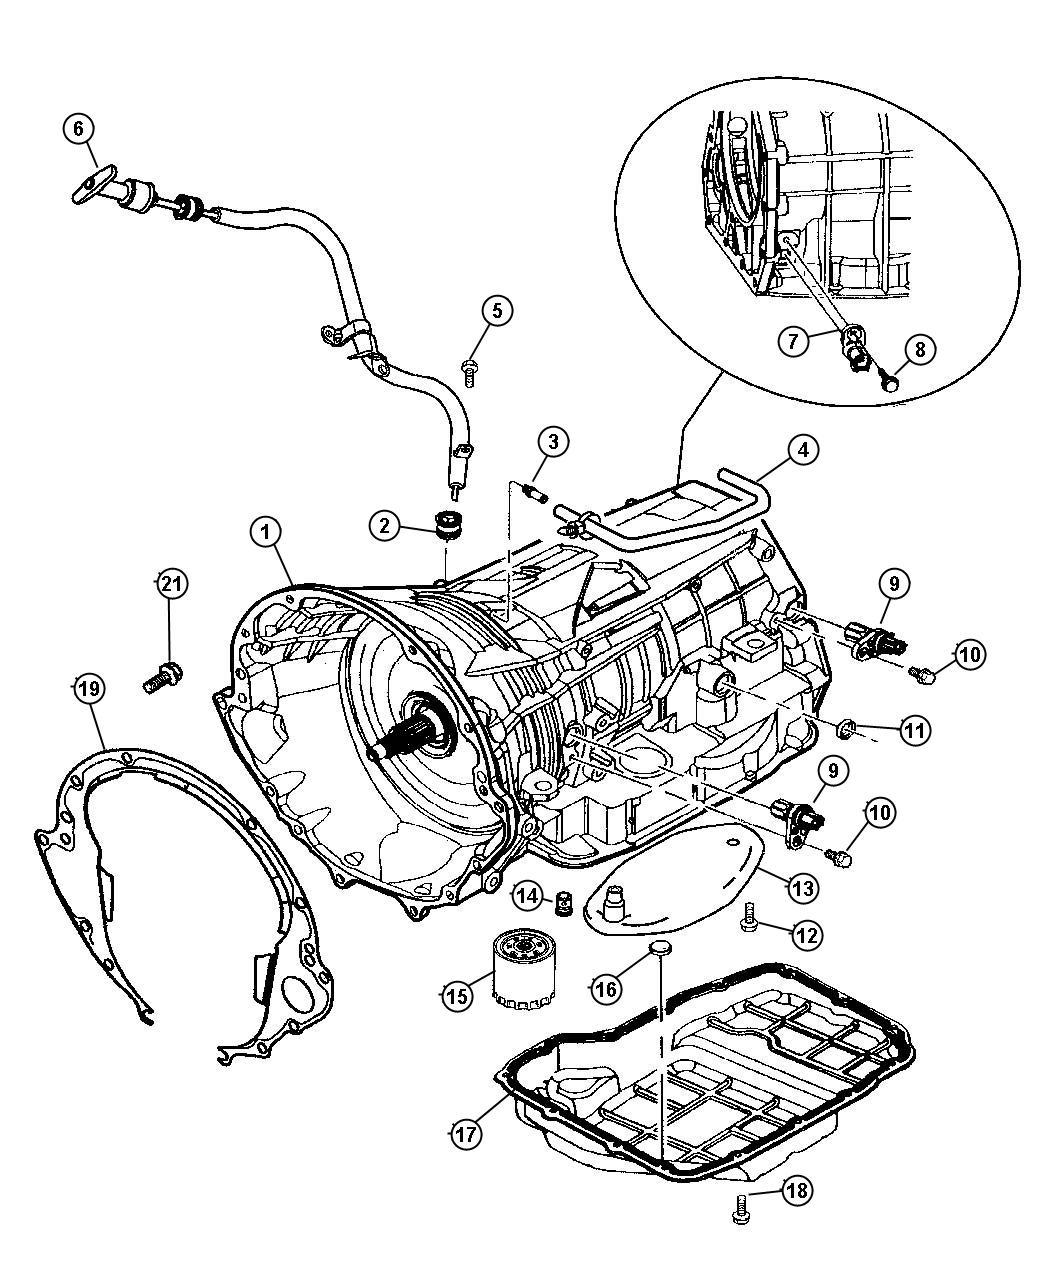 2002 Dodge Ram 1500 Transmission Diagram, 2002, Free